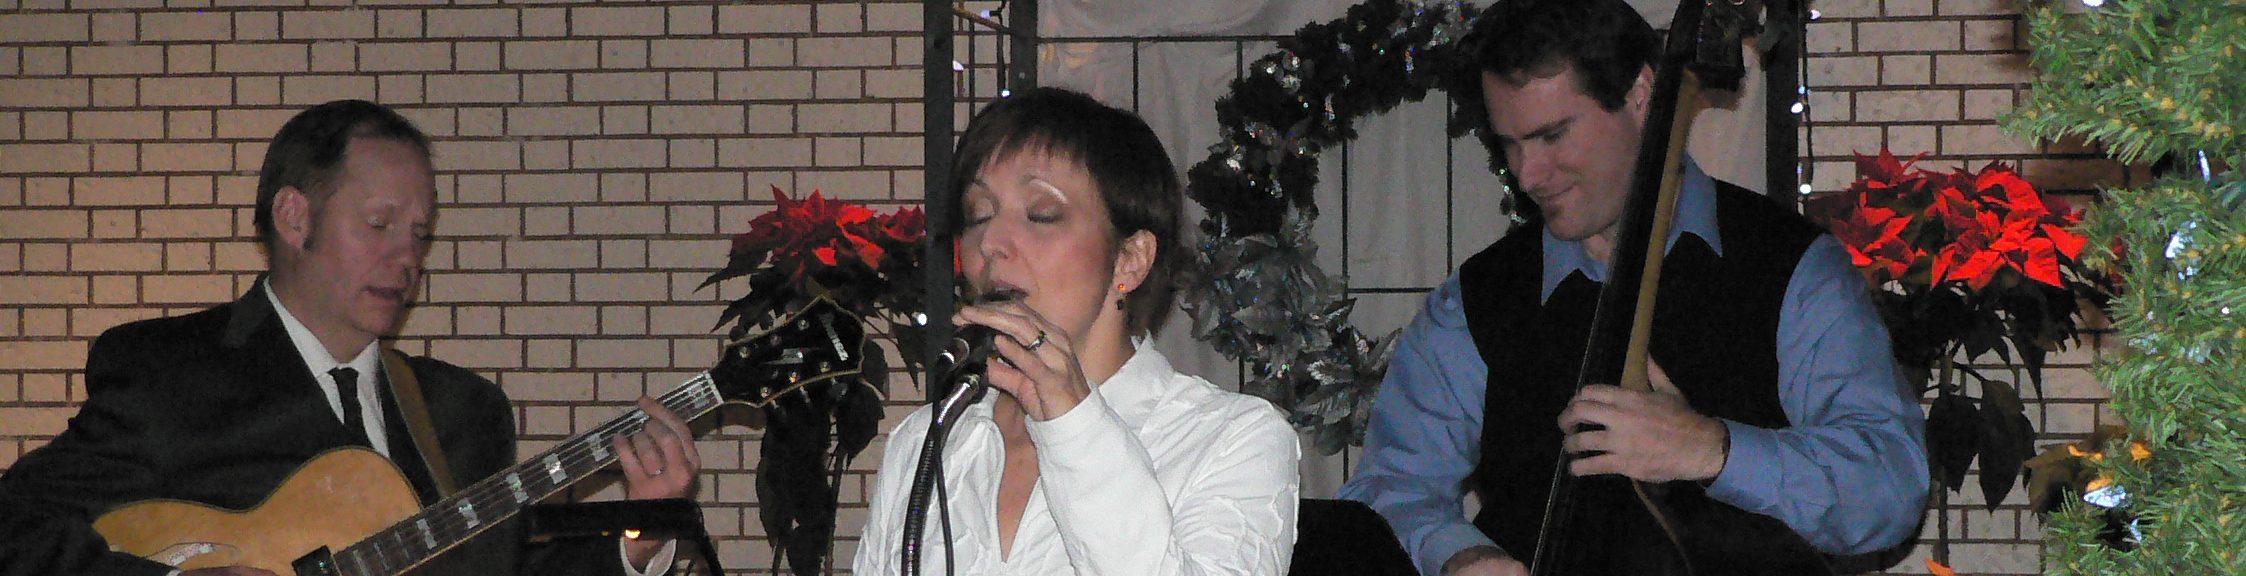 The BUrton Jazz Trio playing a Christmas event